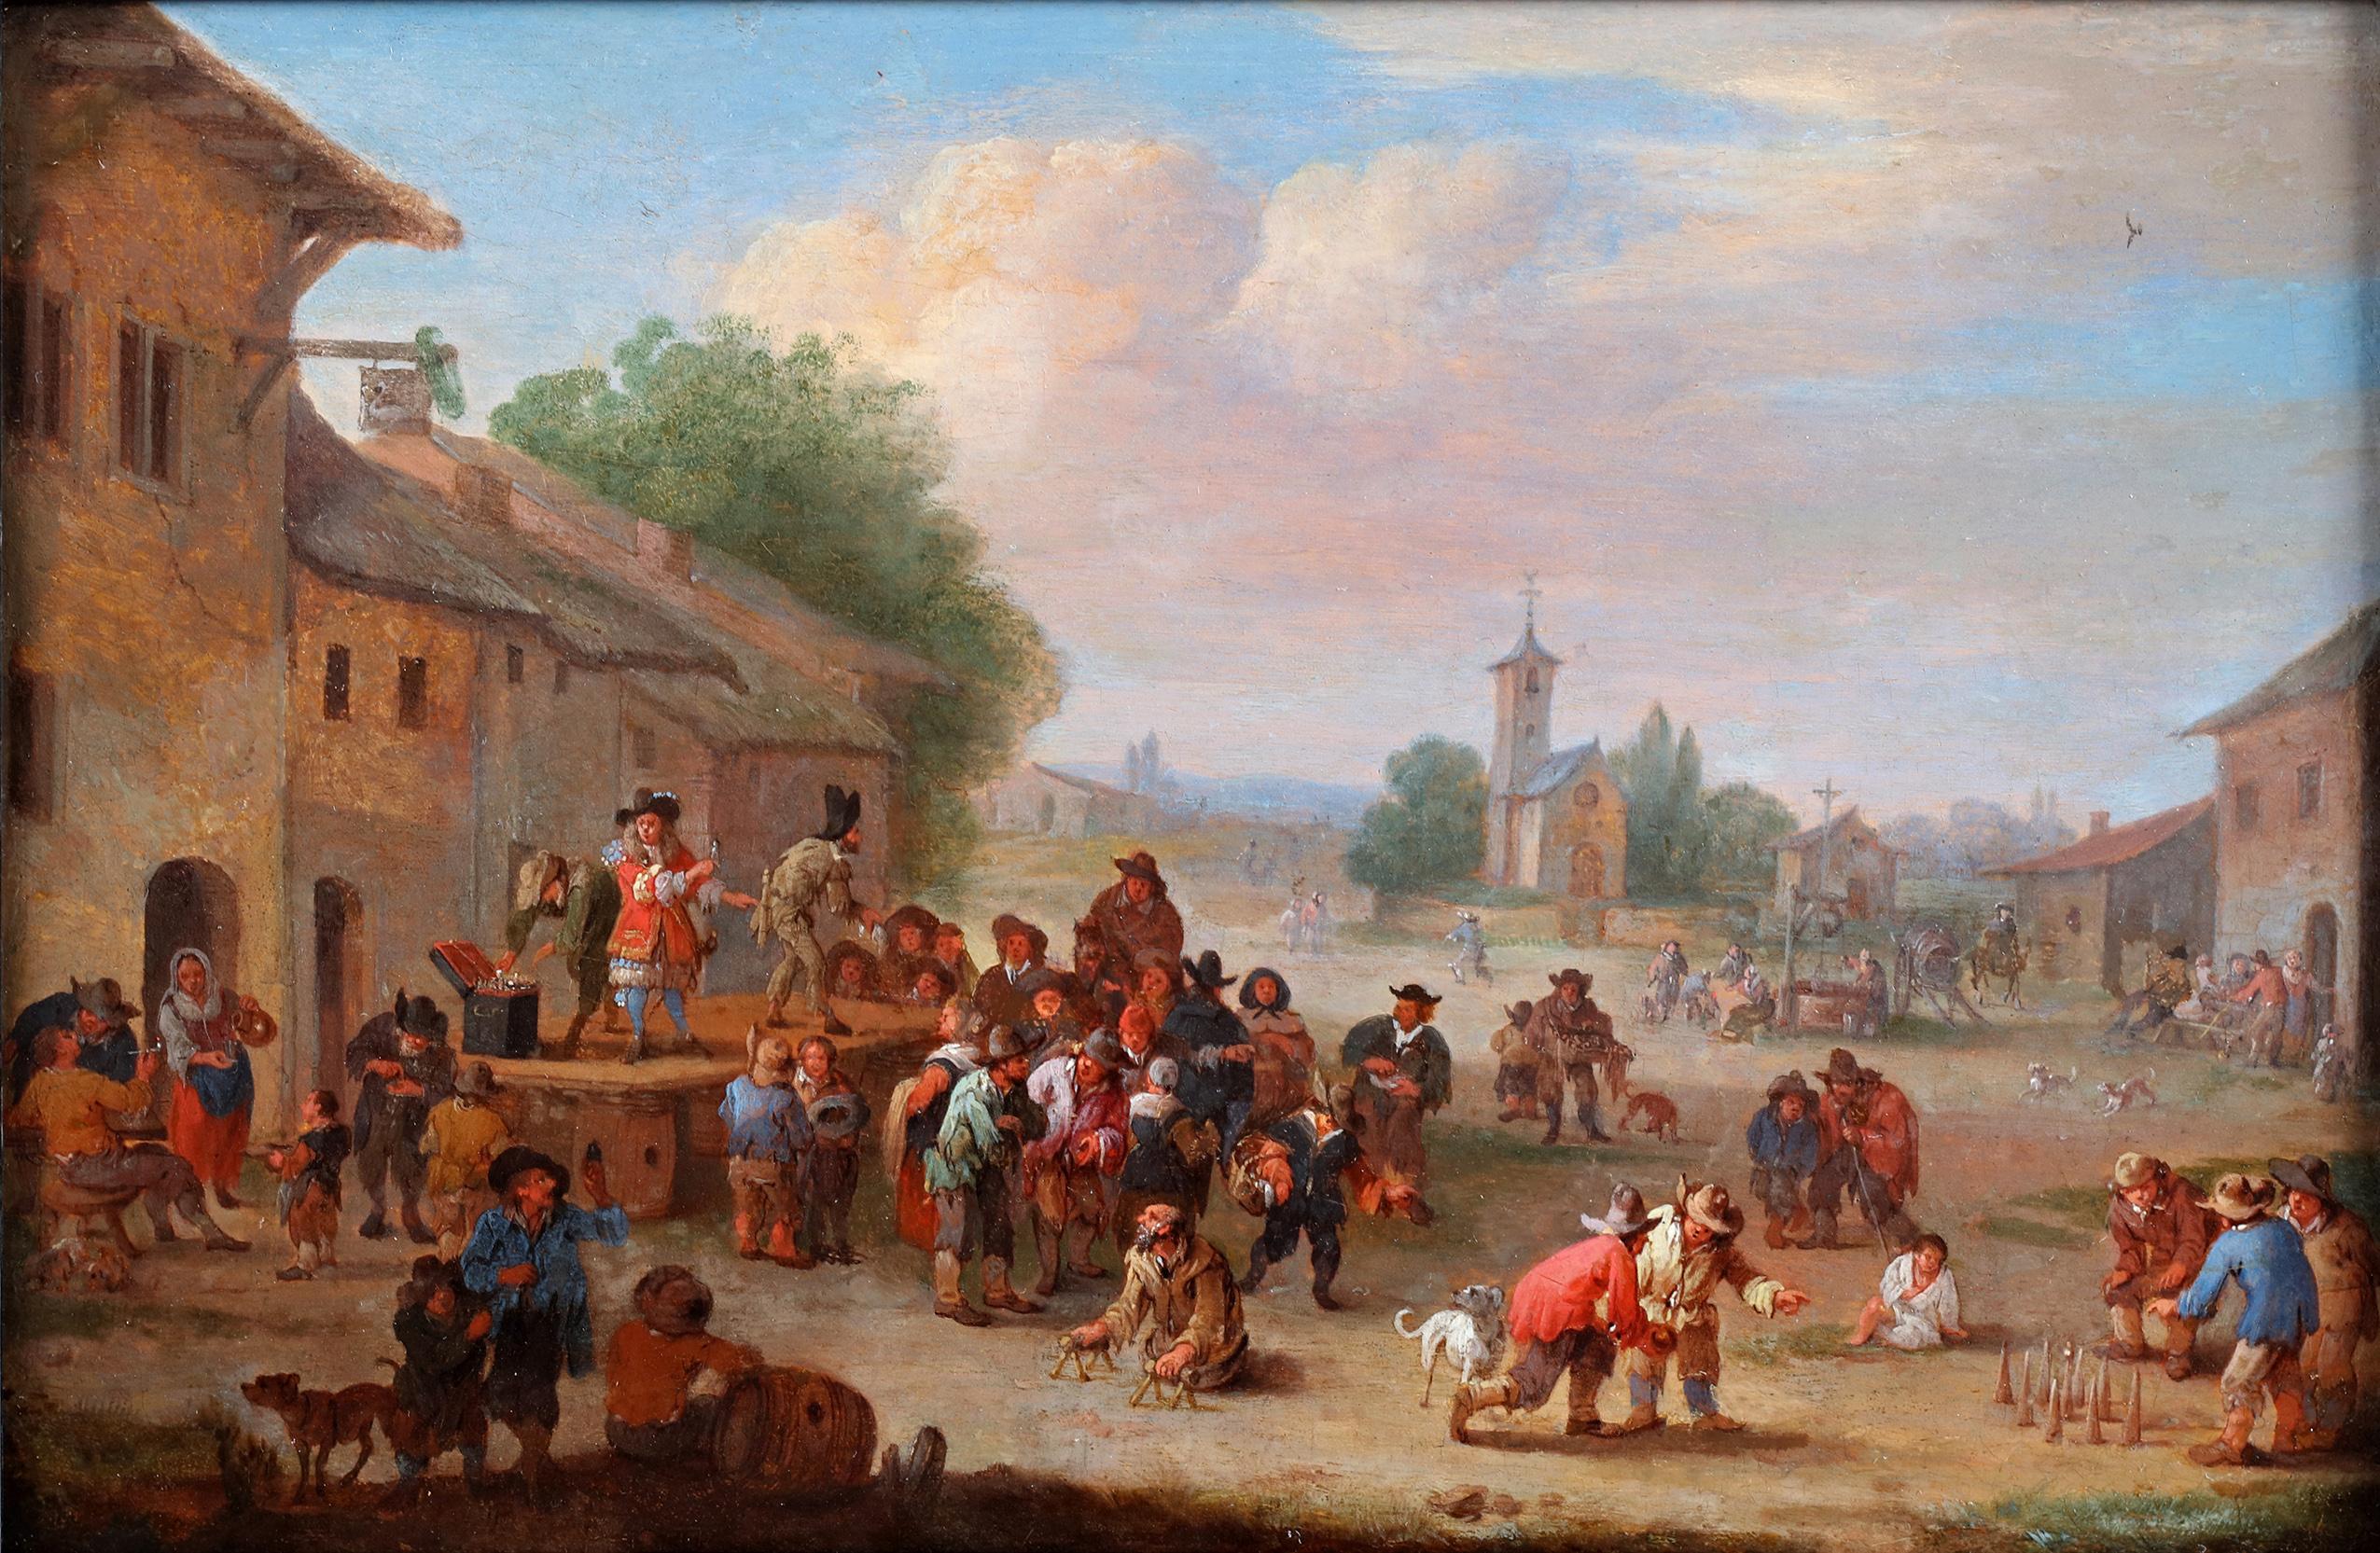 Festivities on the village square